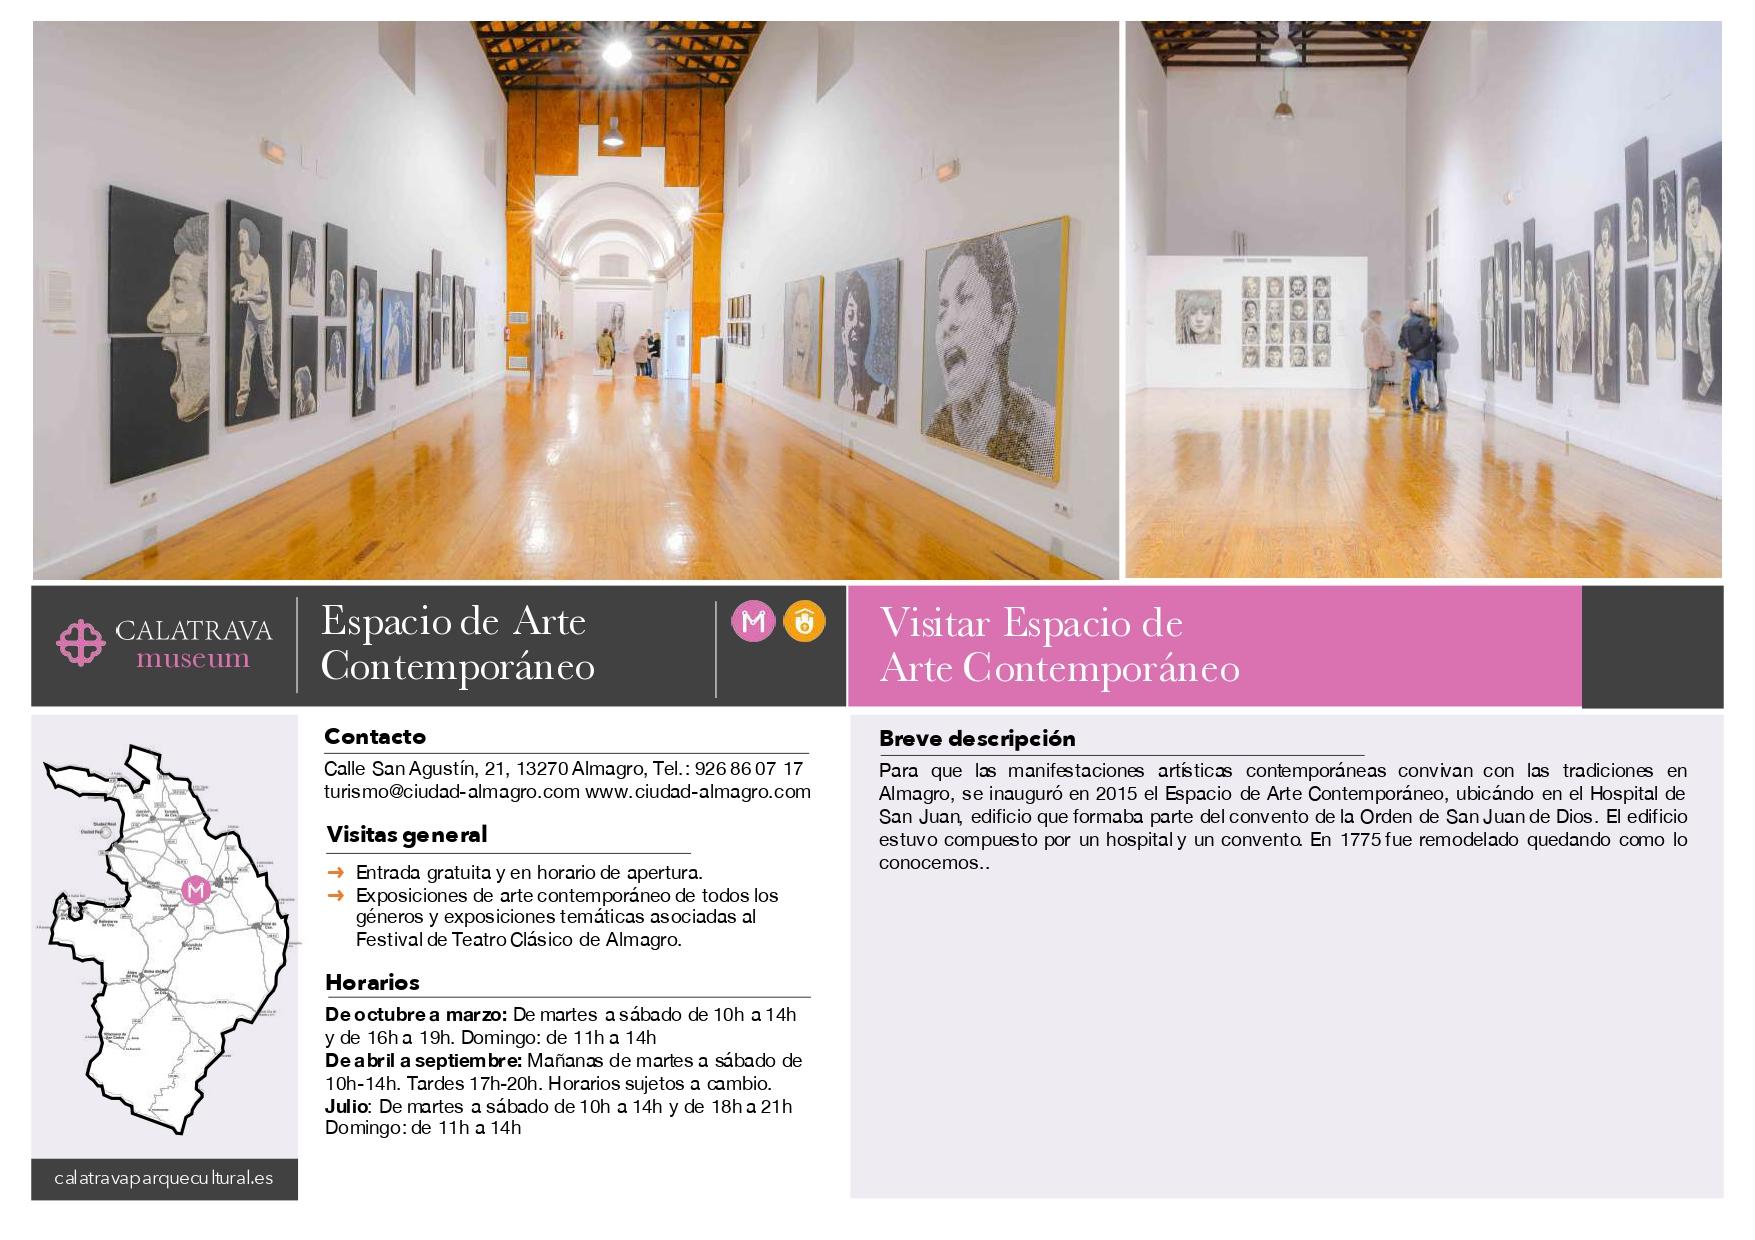 mapa-Espacio de Arte Contemporáneo